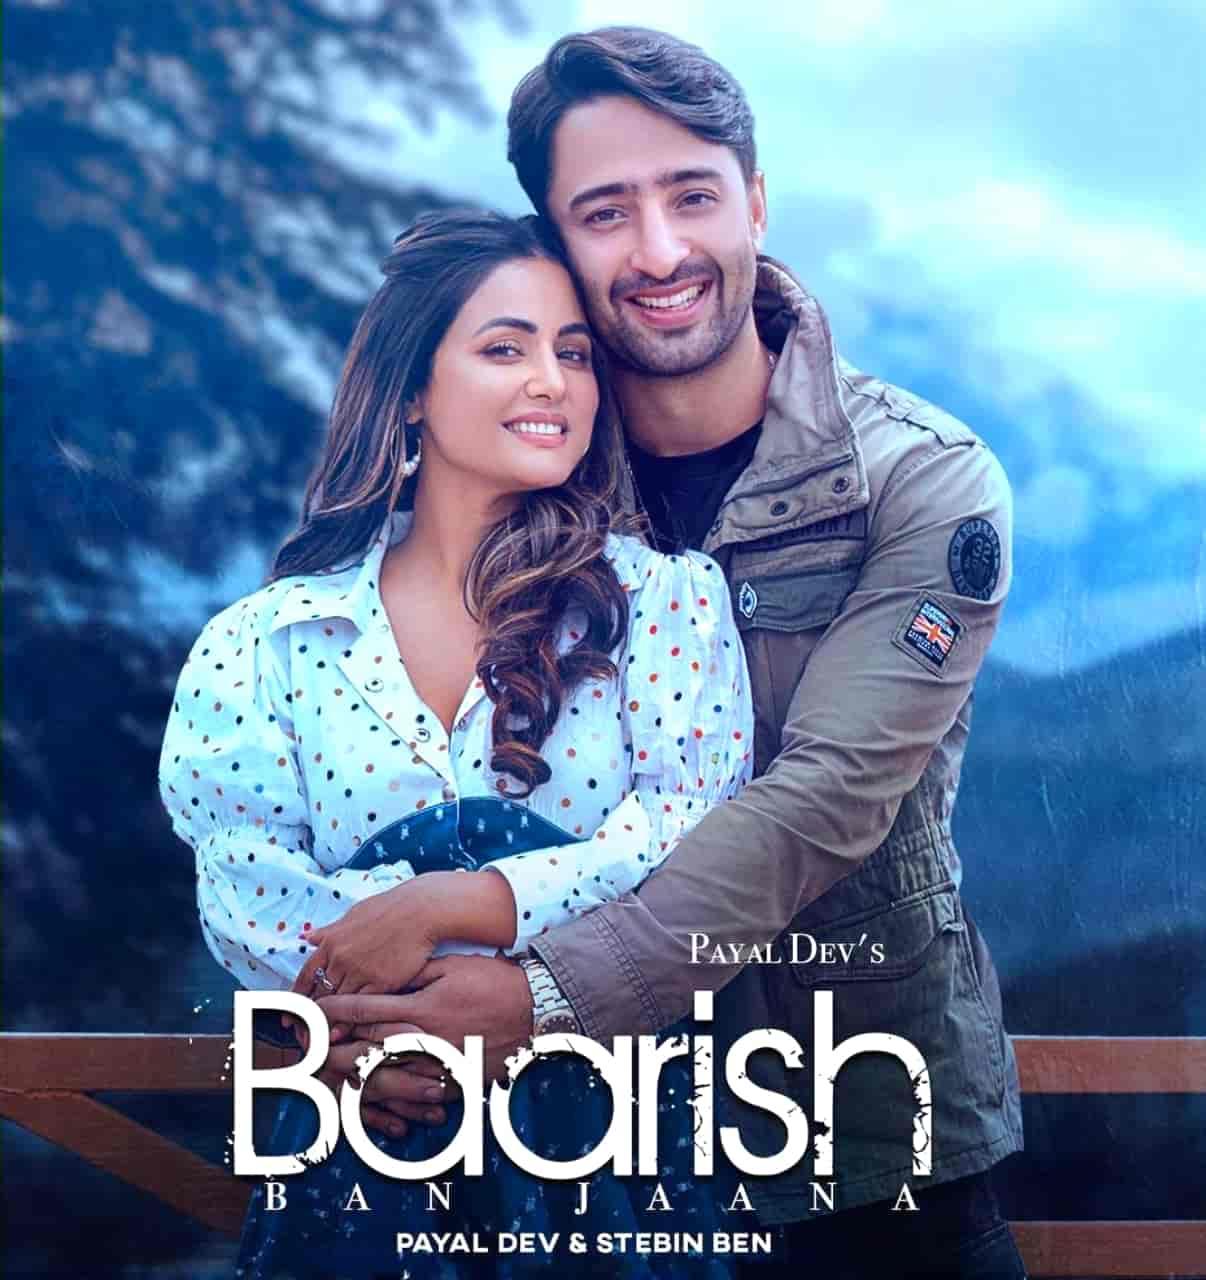 Baarish Ban Jaana Hindi Song Lyrics Payal Dev & Stebin Ben